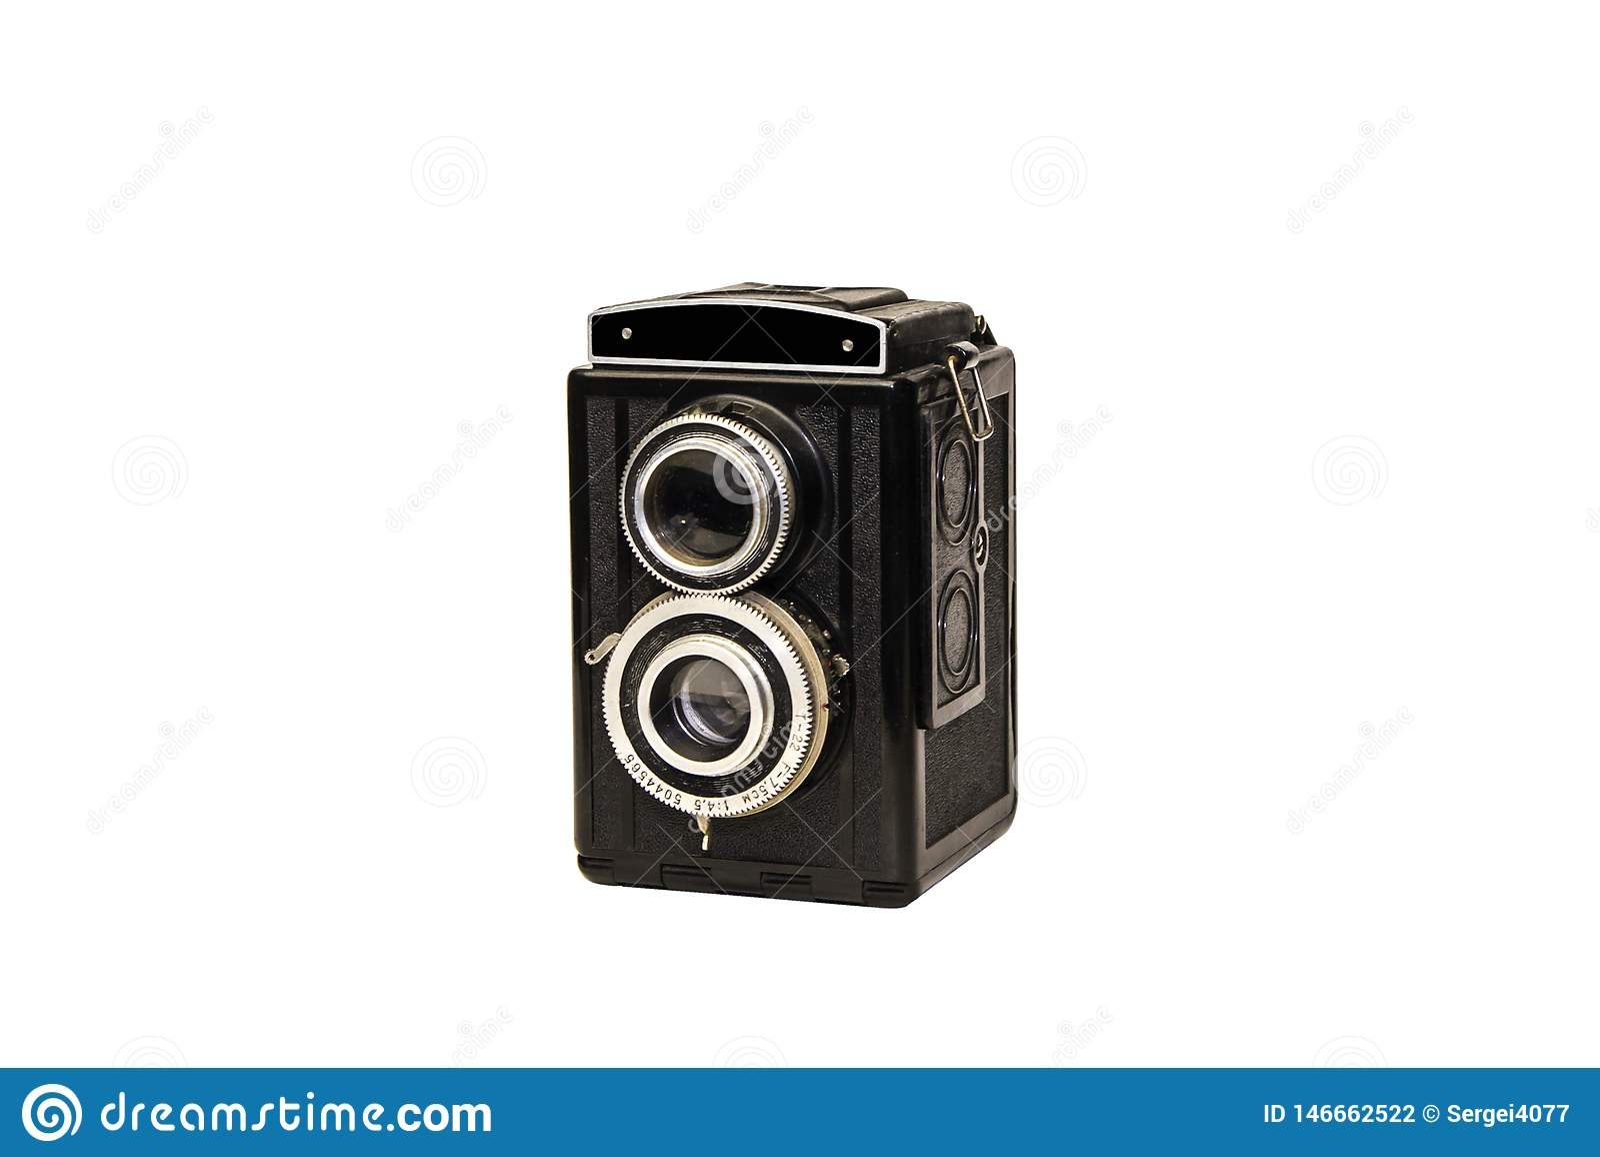 De cameralenzen van de film retro foto